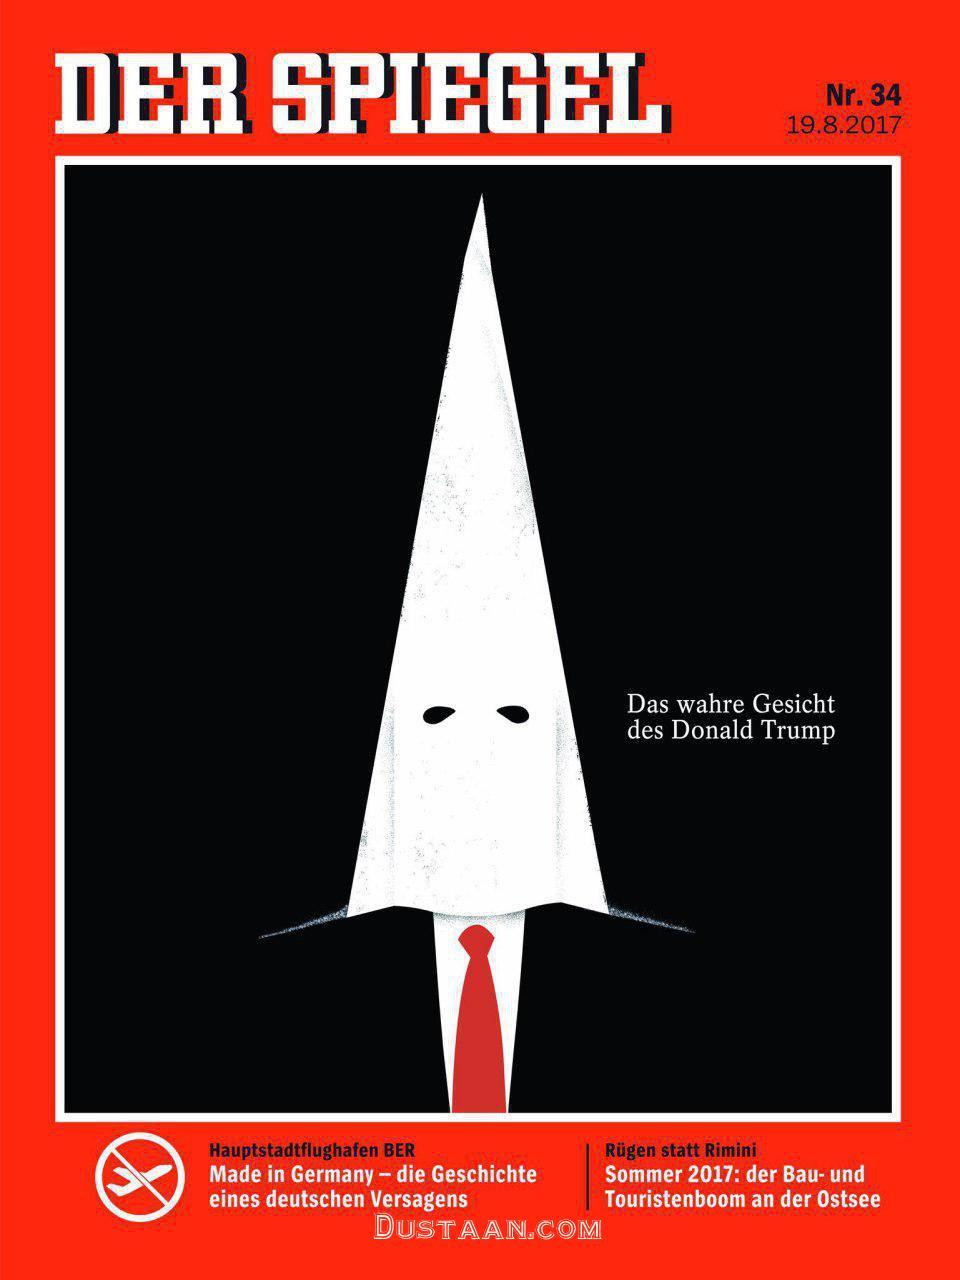 www.dustaan.com چهره واقعی ترامپ روی جلد یک نشریه